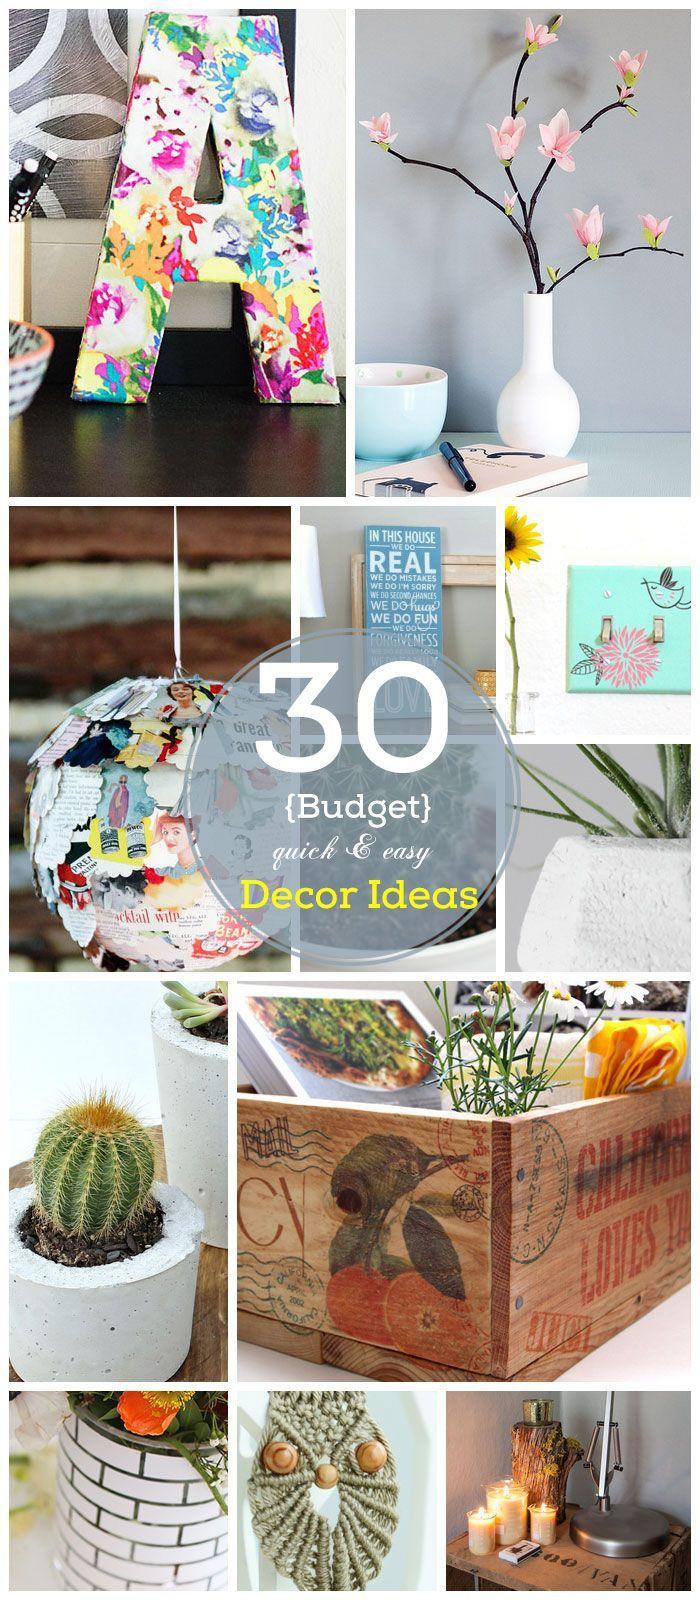 best kreativa images on pinterest craft ideas creative ideas